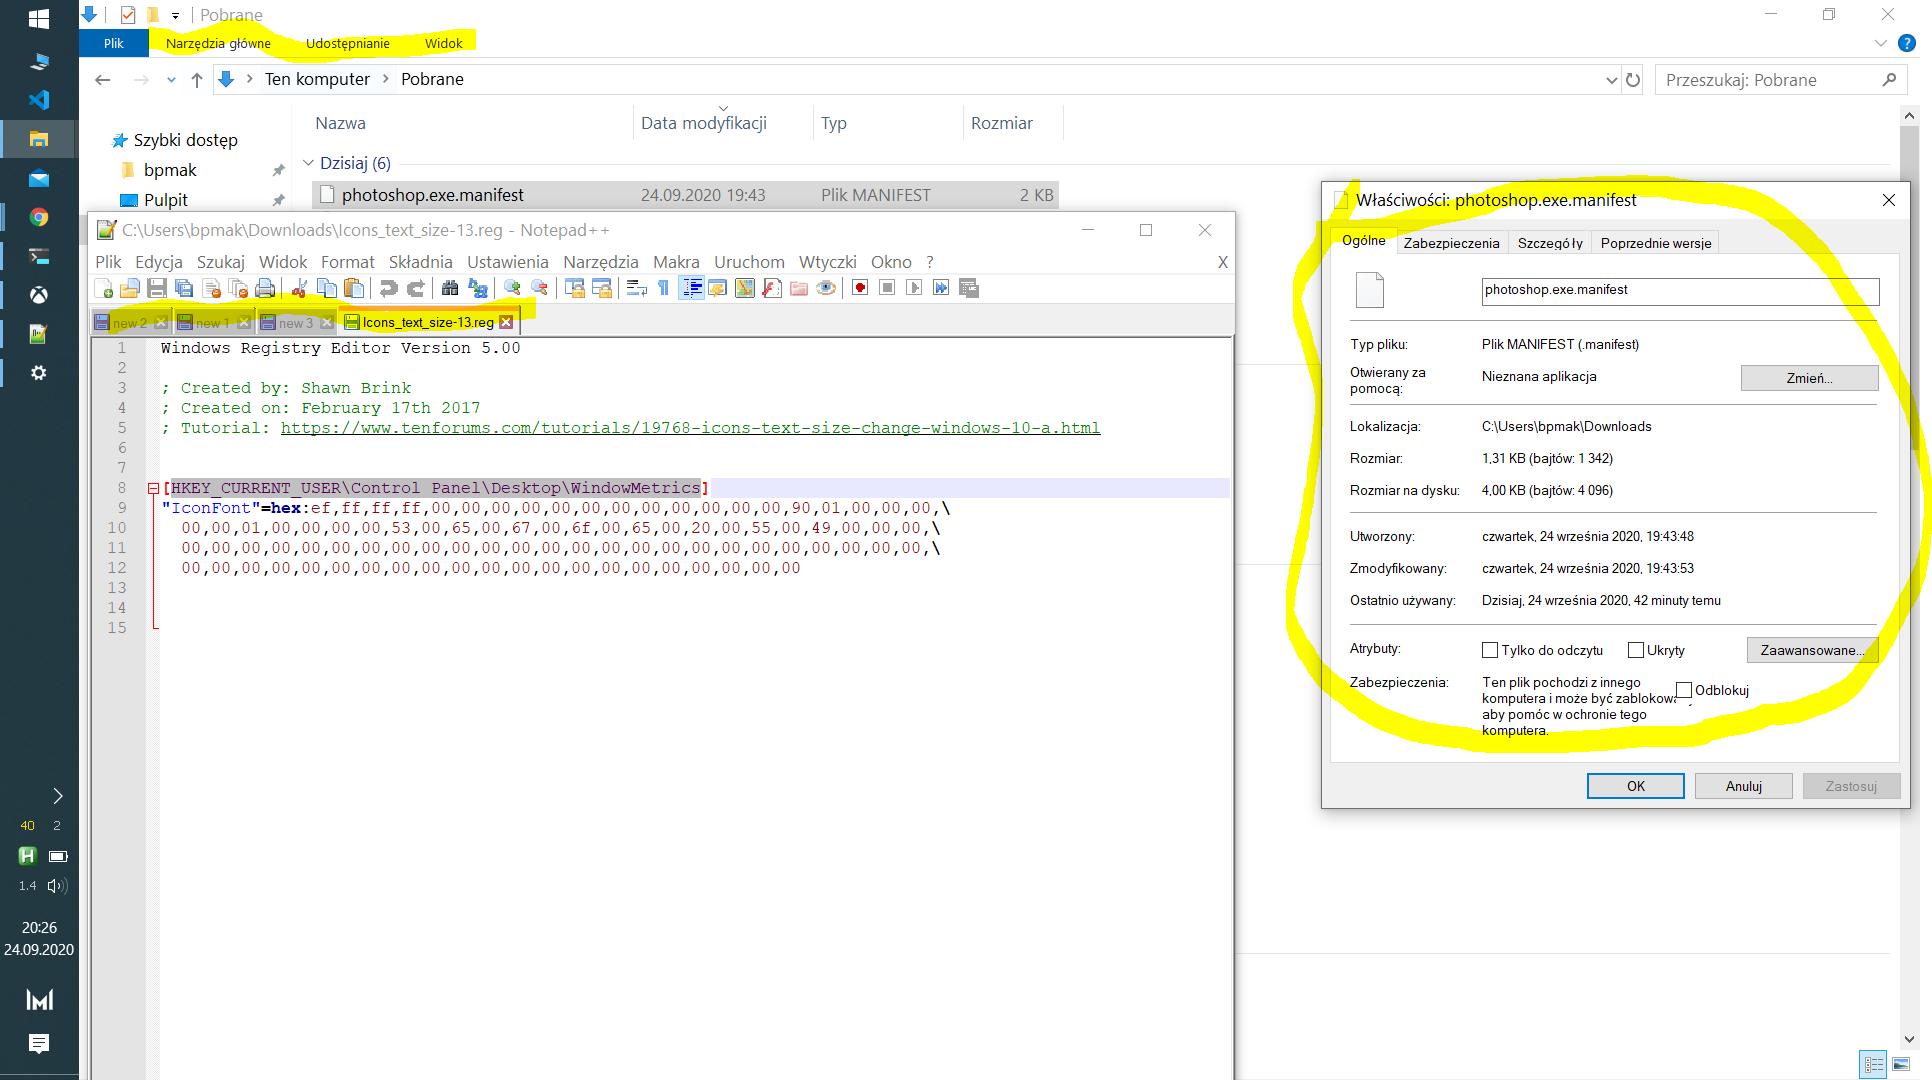 Application properties font size. 36255594-0e73-4c68-984d-552cf1c43664?upload=true.png